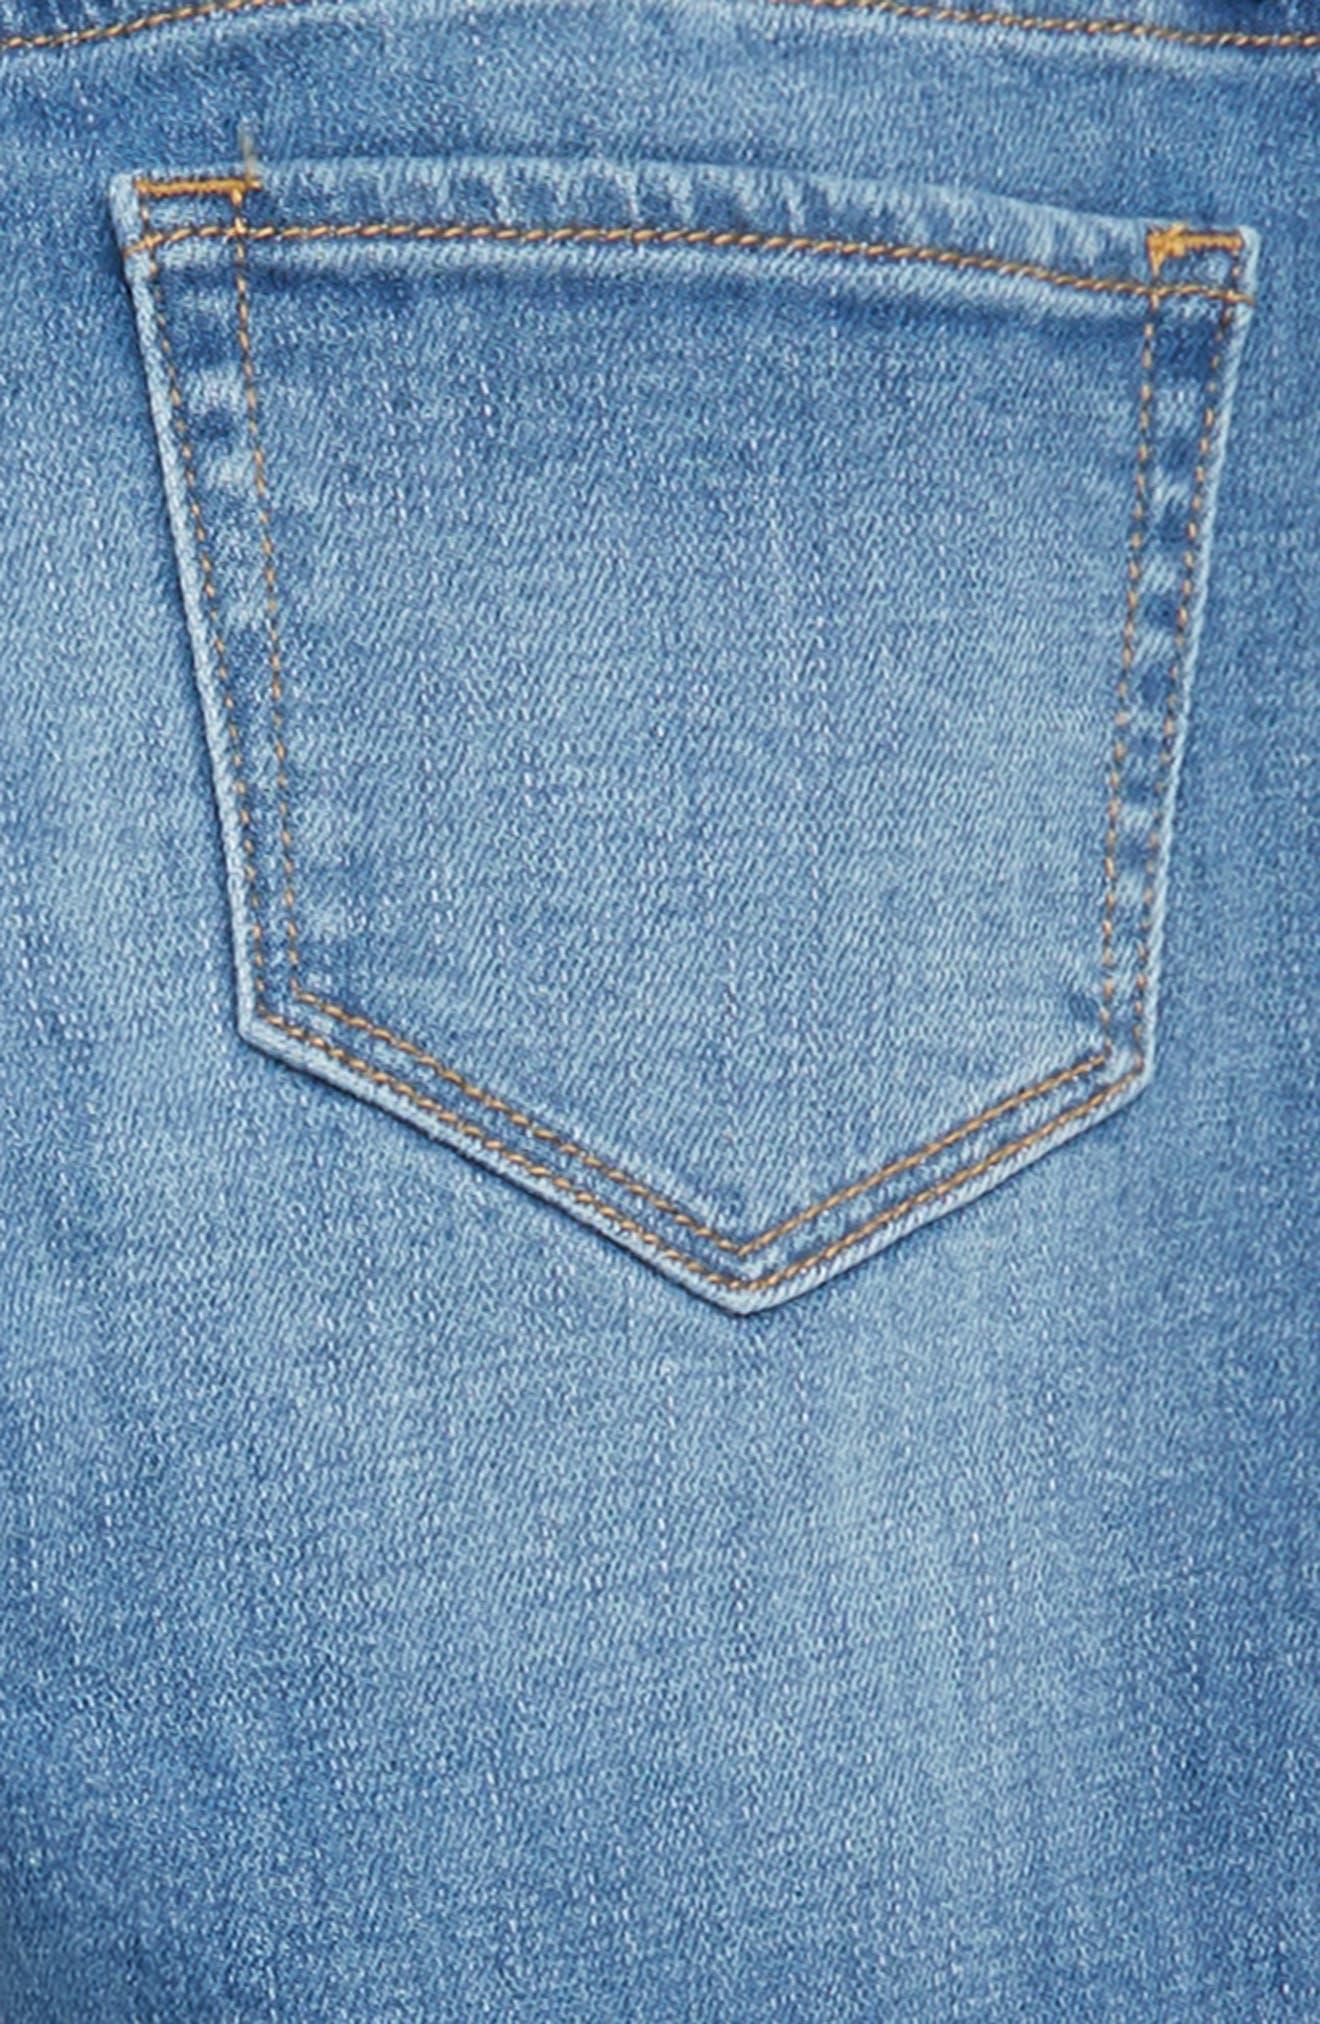 Embroidered Fray Hem Skinny Jeans,                             Alternate thumbnail 3, color,